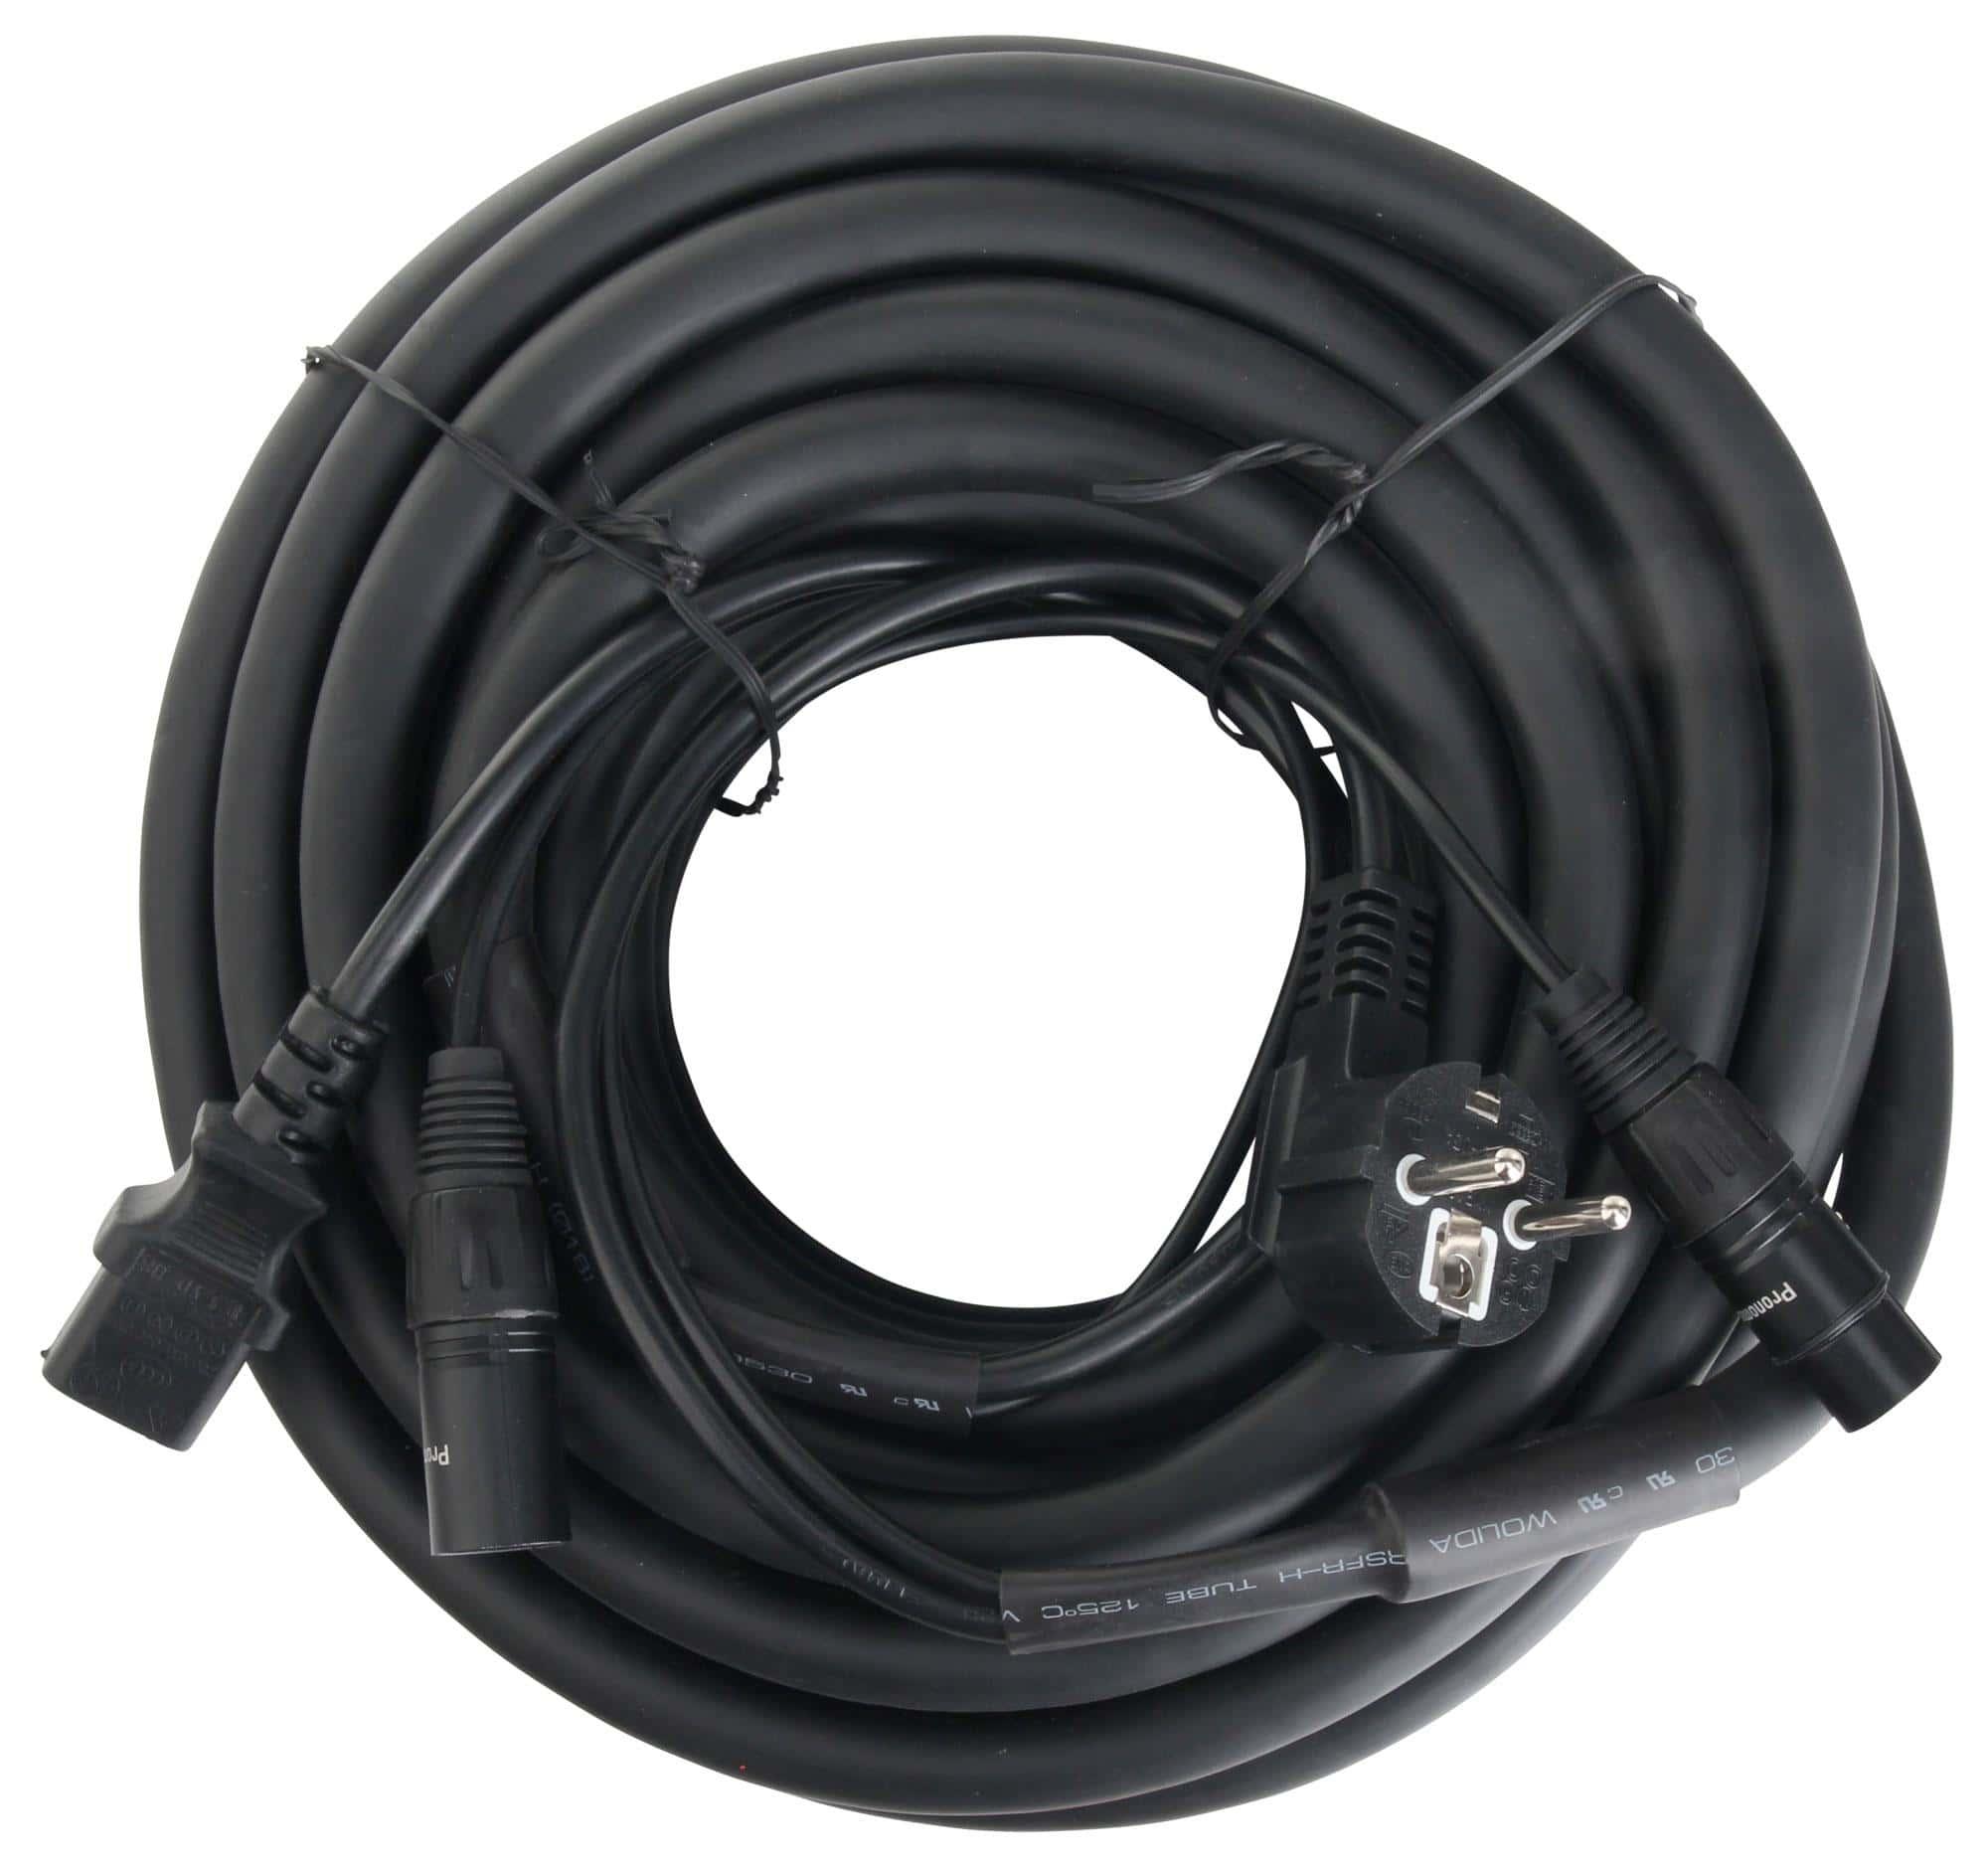 Pronomic Stage EUIECX-15 Hybrid Cable Schuko plug to IEC connector ...